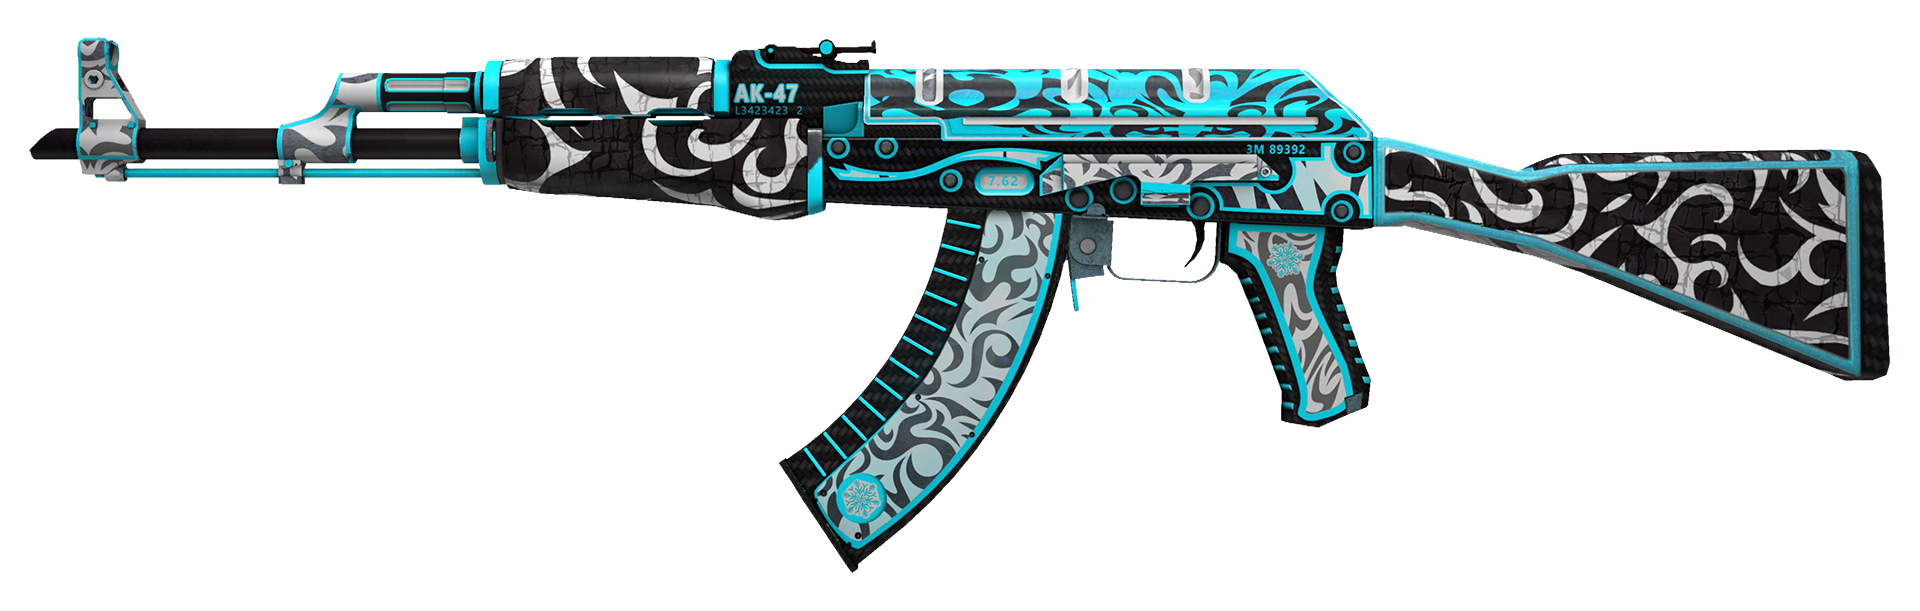 AK-47 Frontside Misty Large Rendering